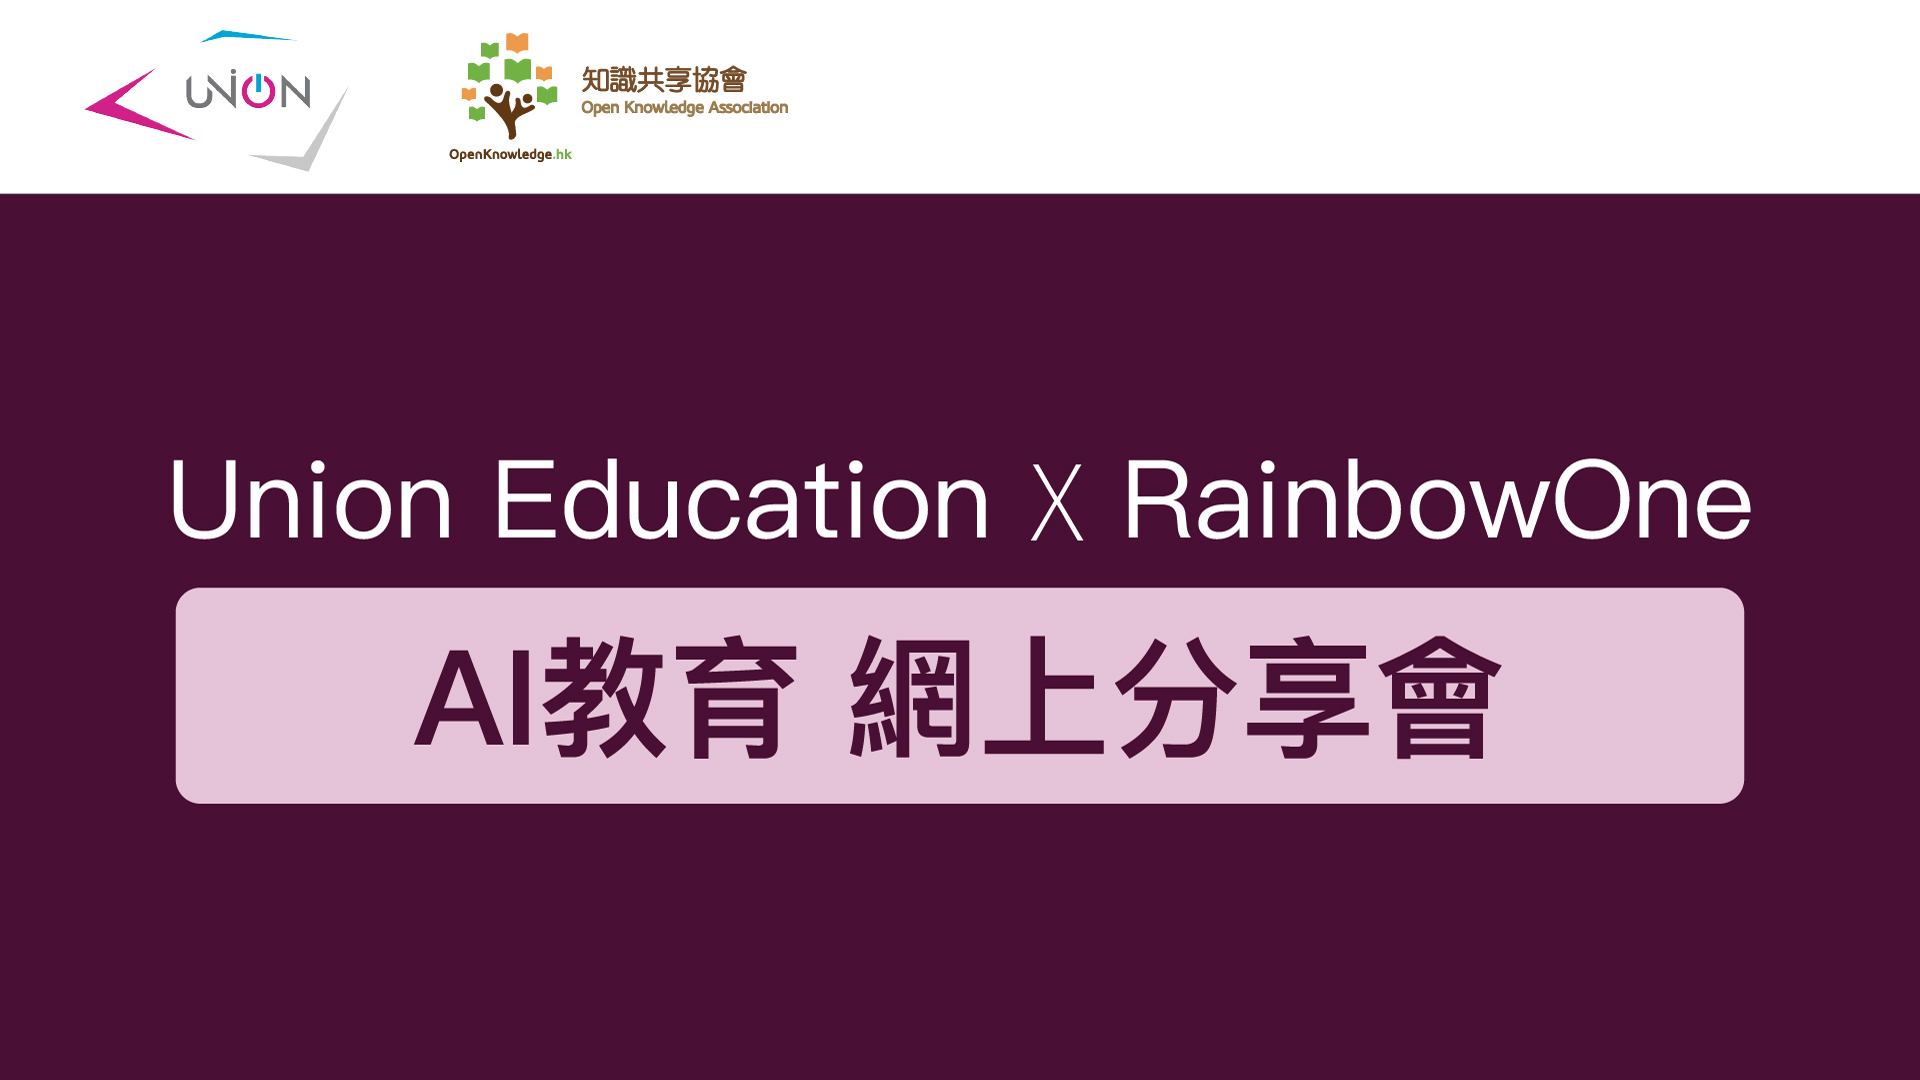 【網上分享會回顧】Union Education X RainbowOne - AI 教育